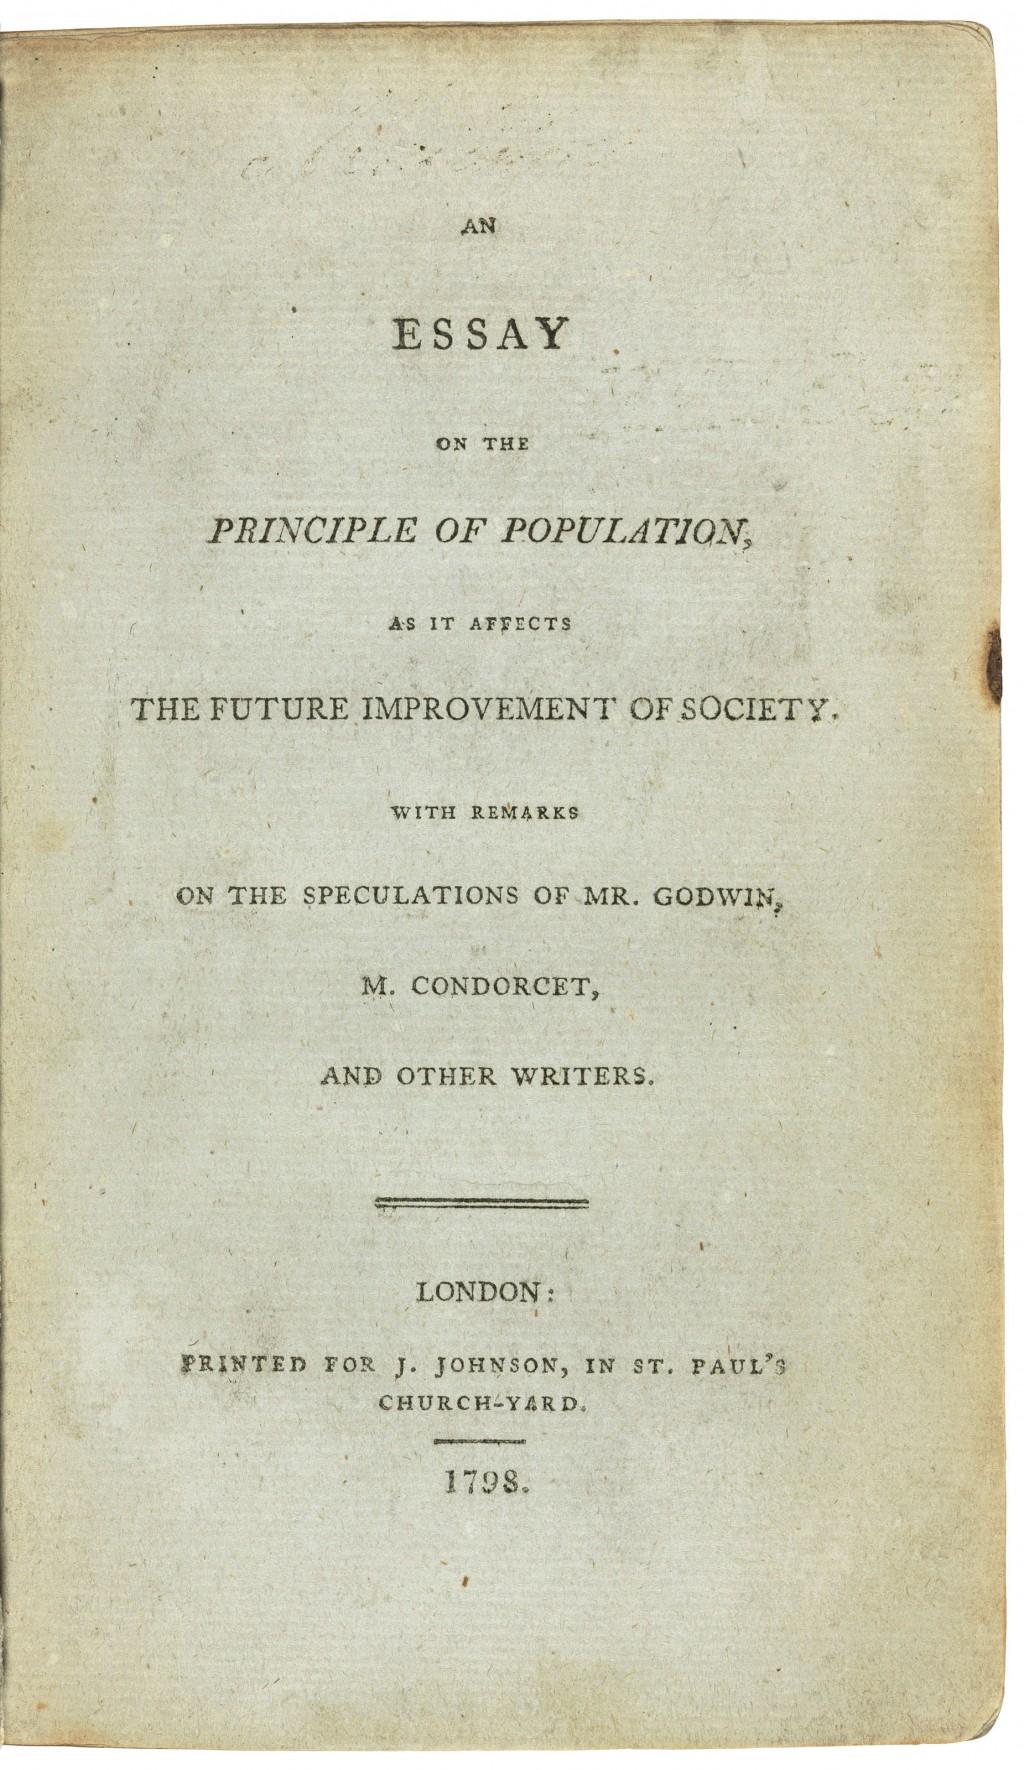 013 2018 Cks 16018 0261 000malthus Thomas Robert An Essay On The Principle Of As It Af Example Singular Population Pdf By Malthus Main Idea Large